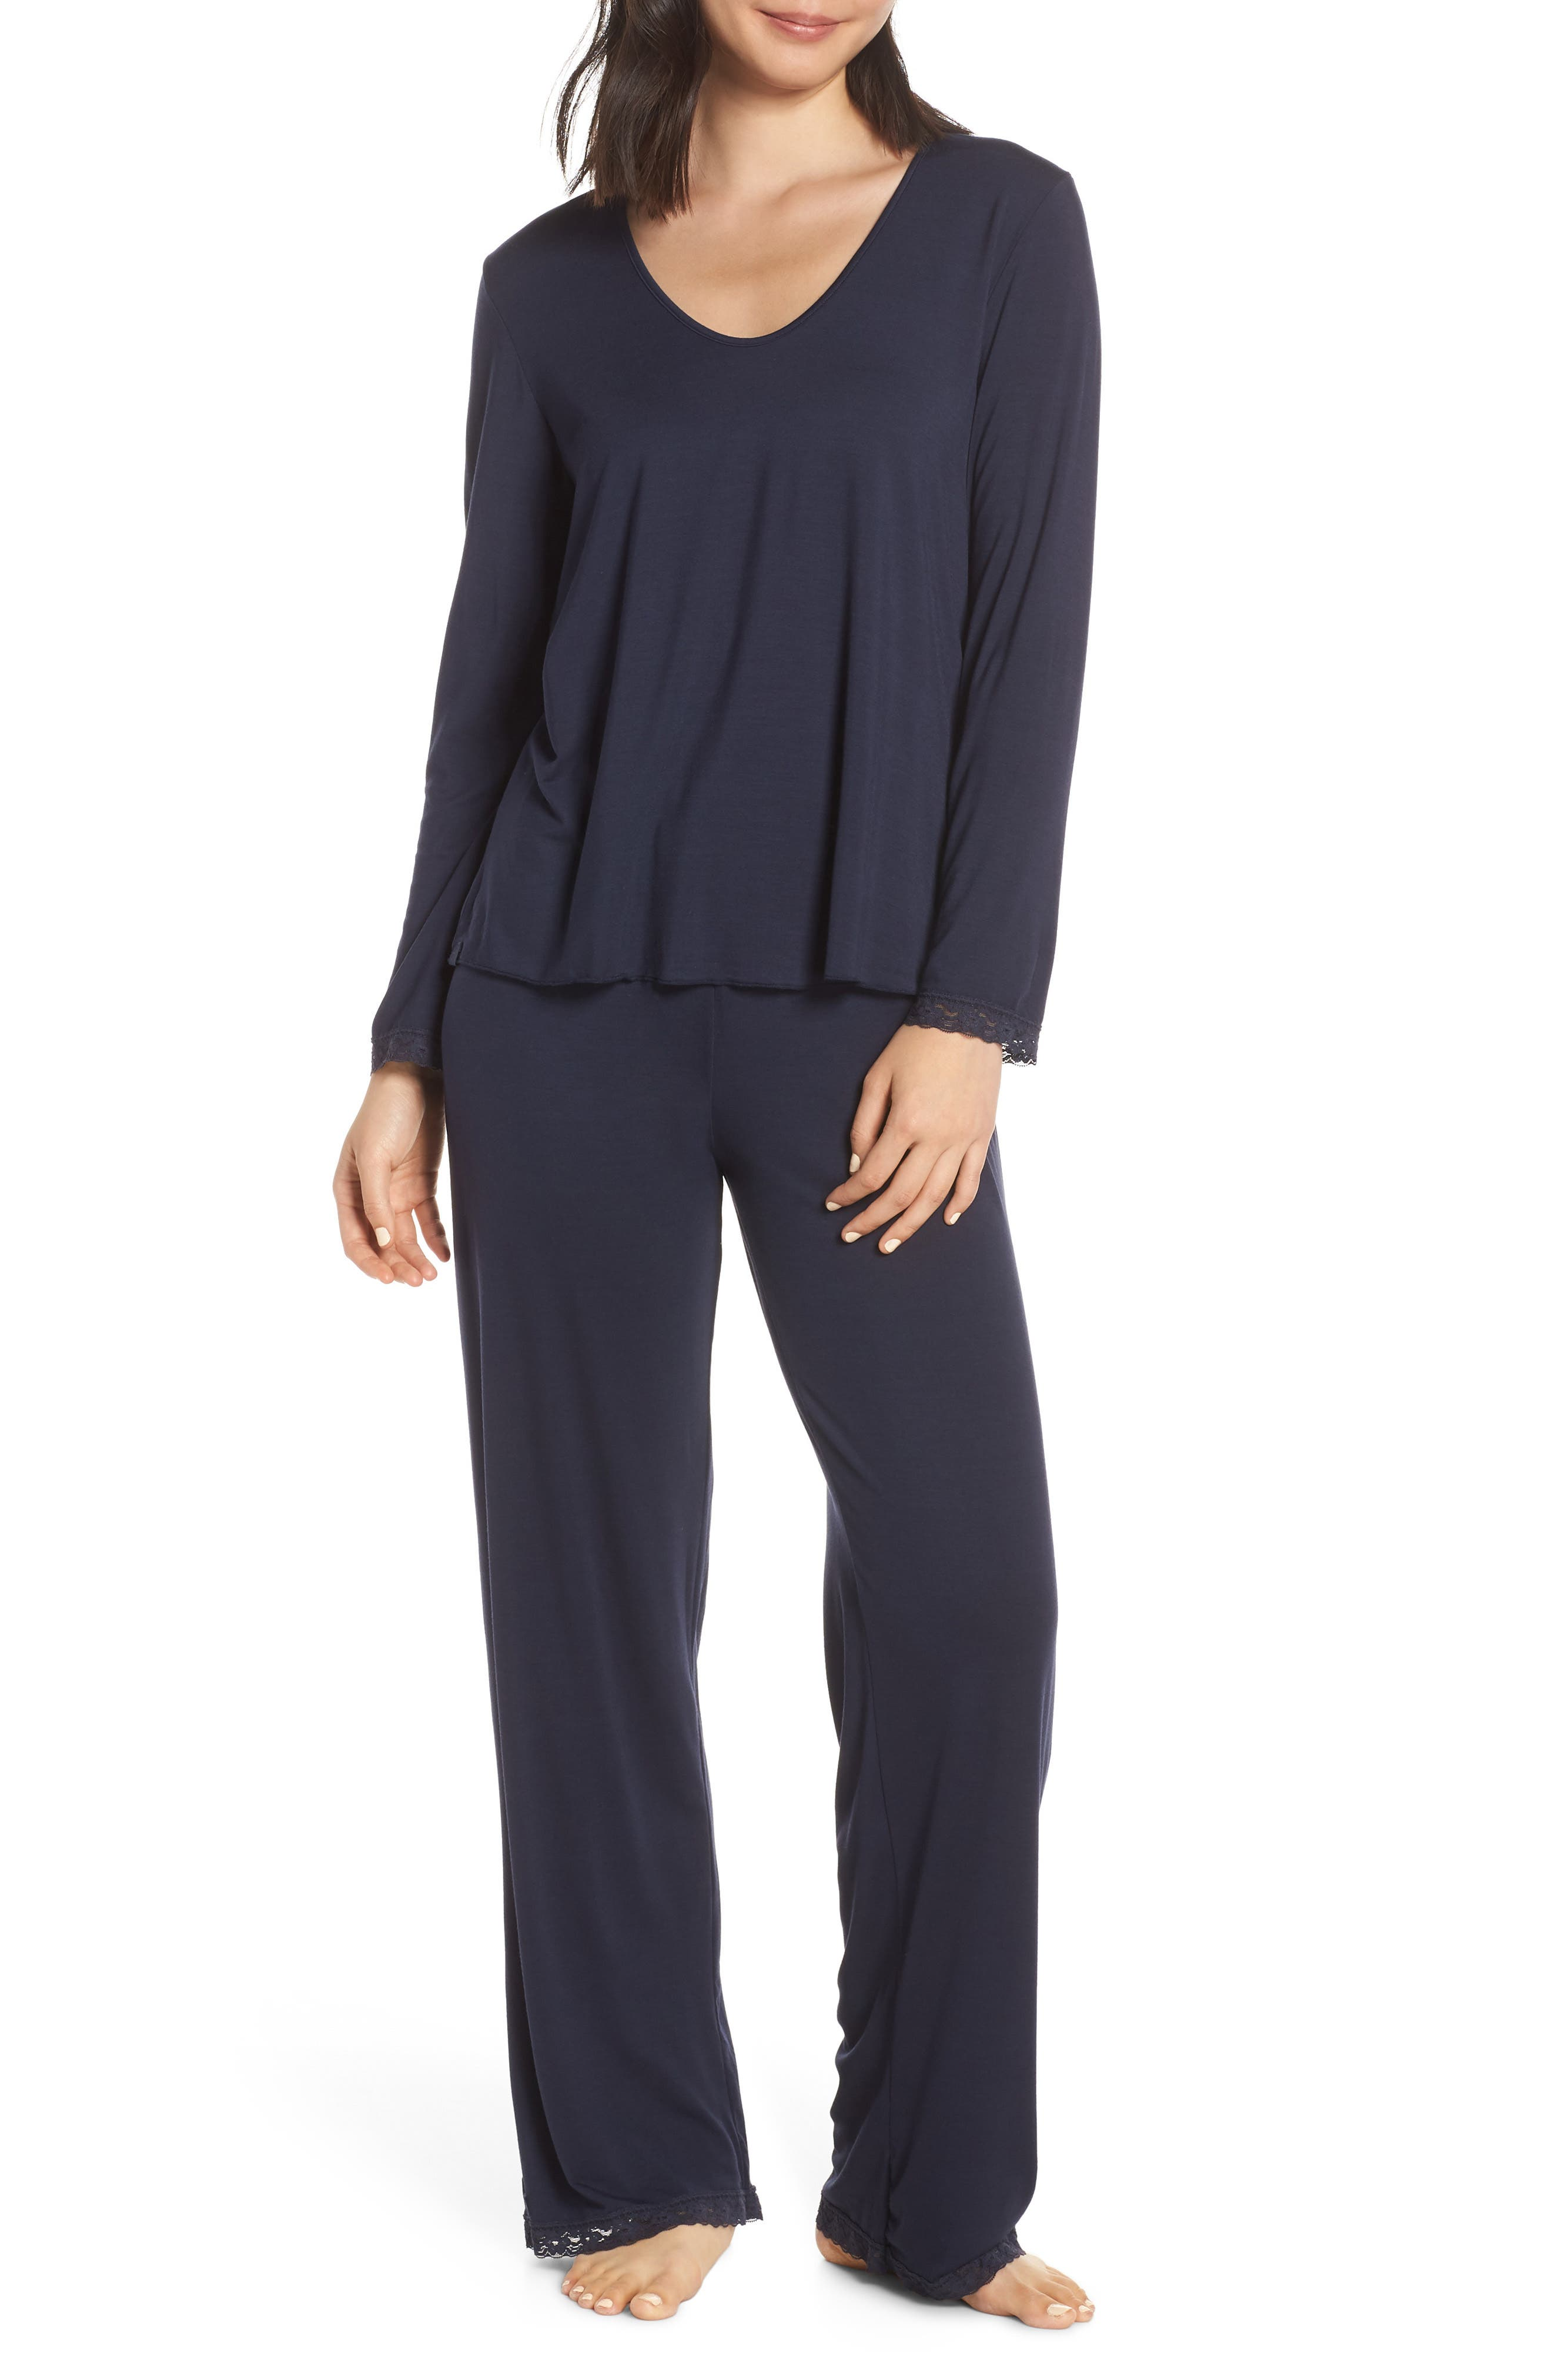 Women's Barefoot Dreams Luxe Jersey Pajamas